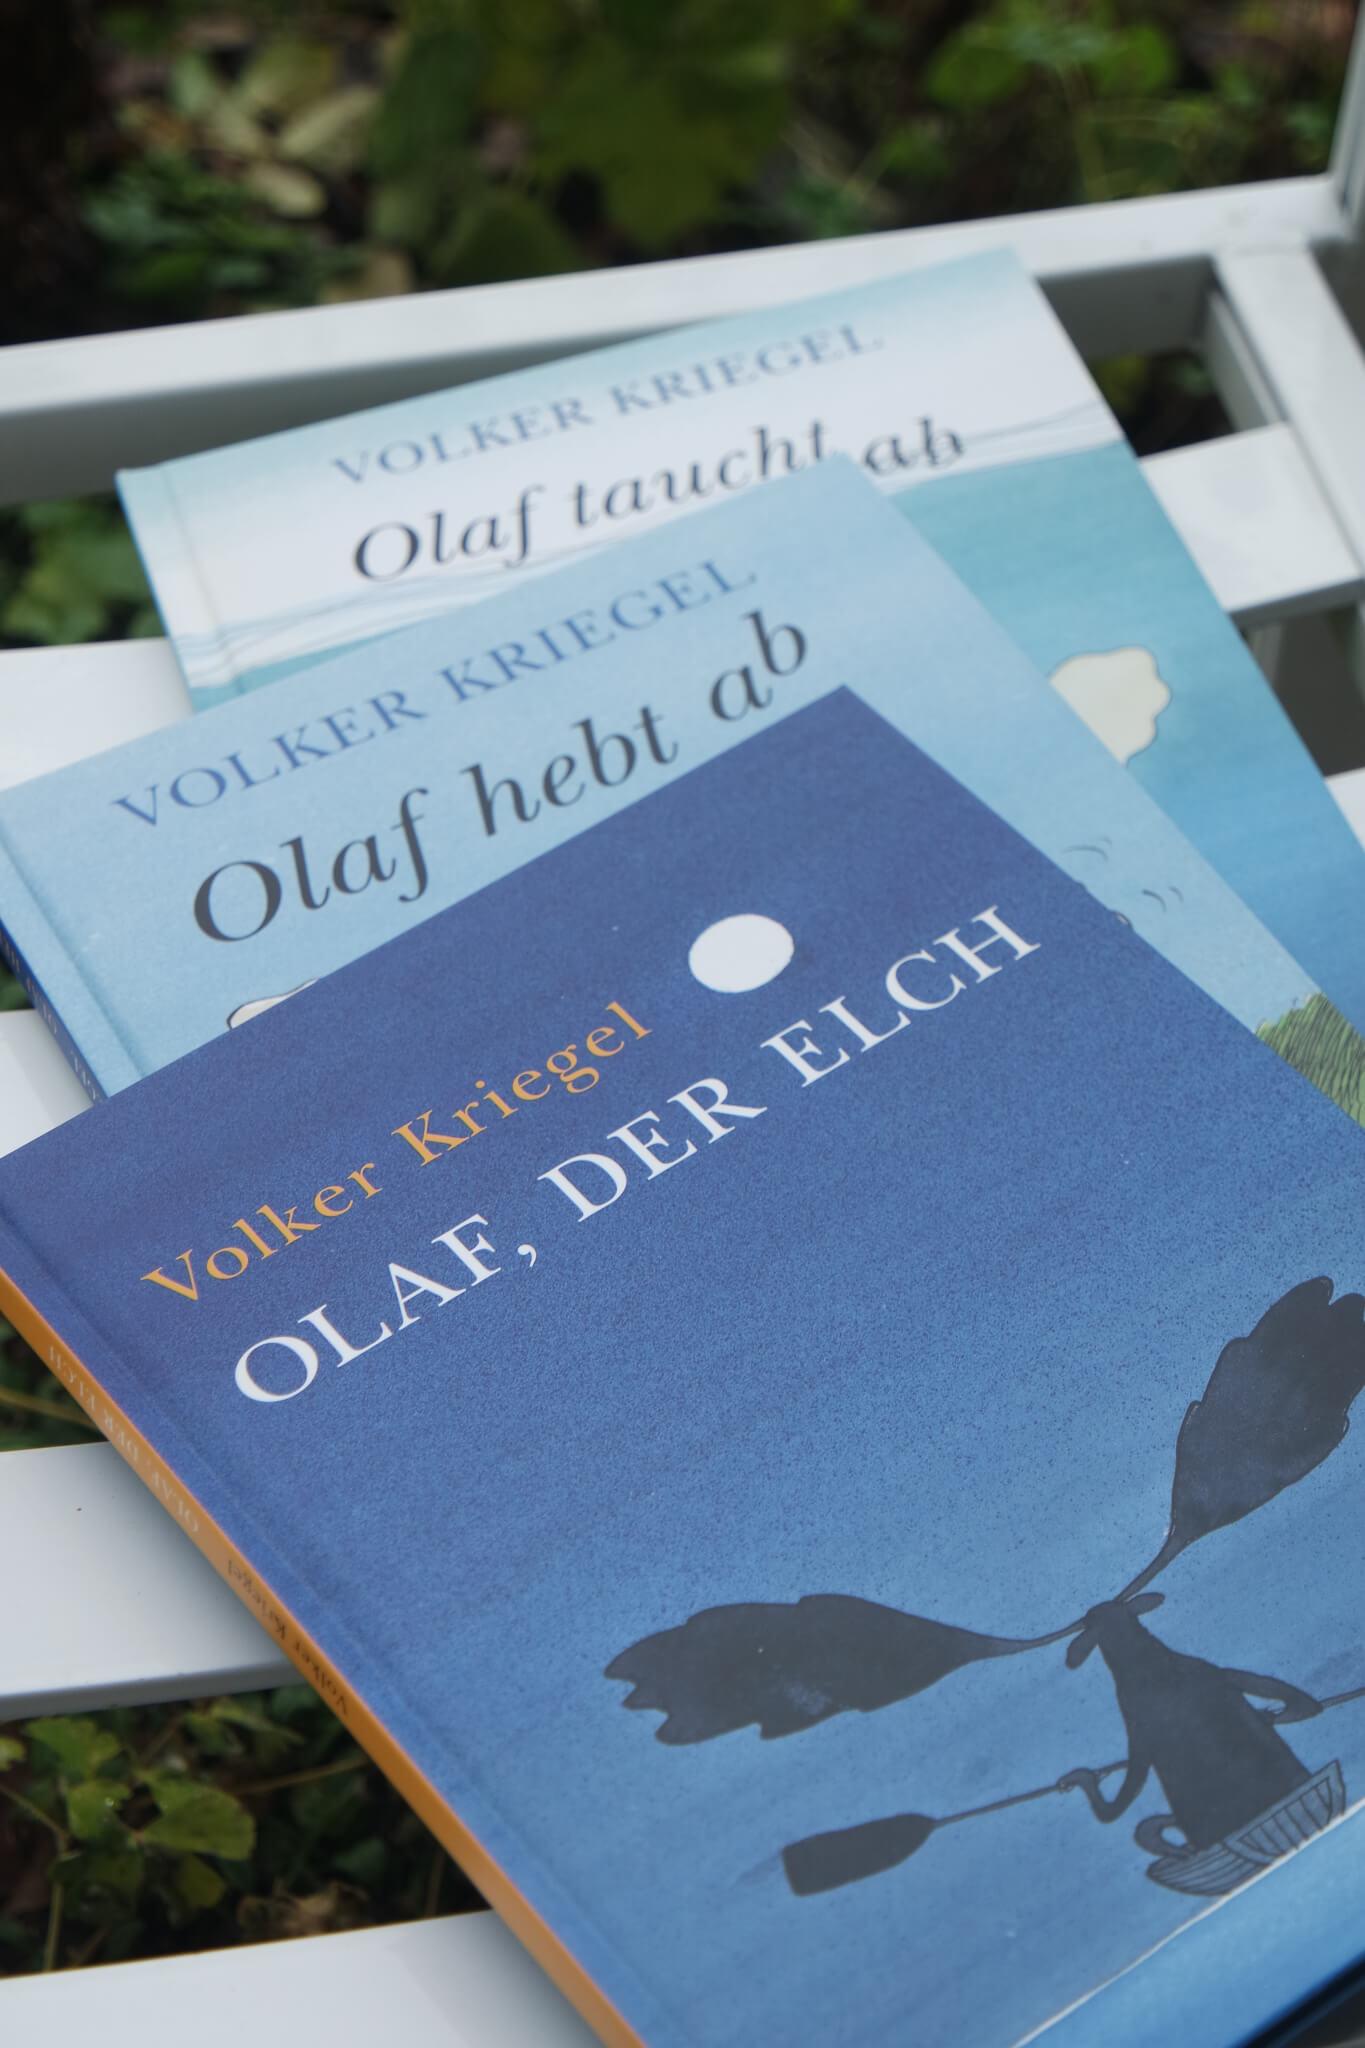 Die Olaf Sammlung